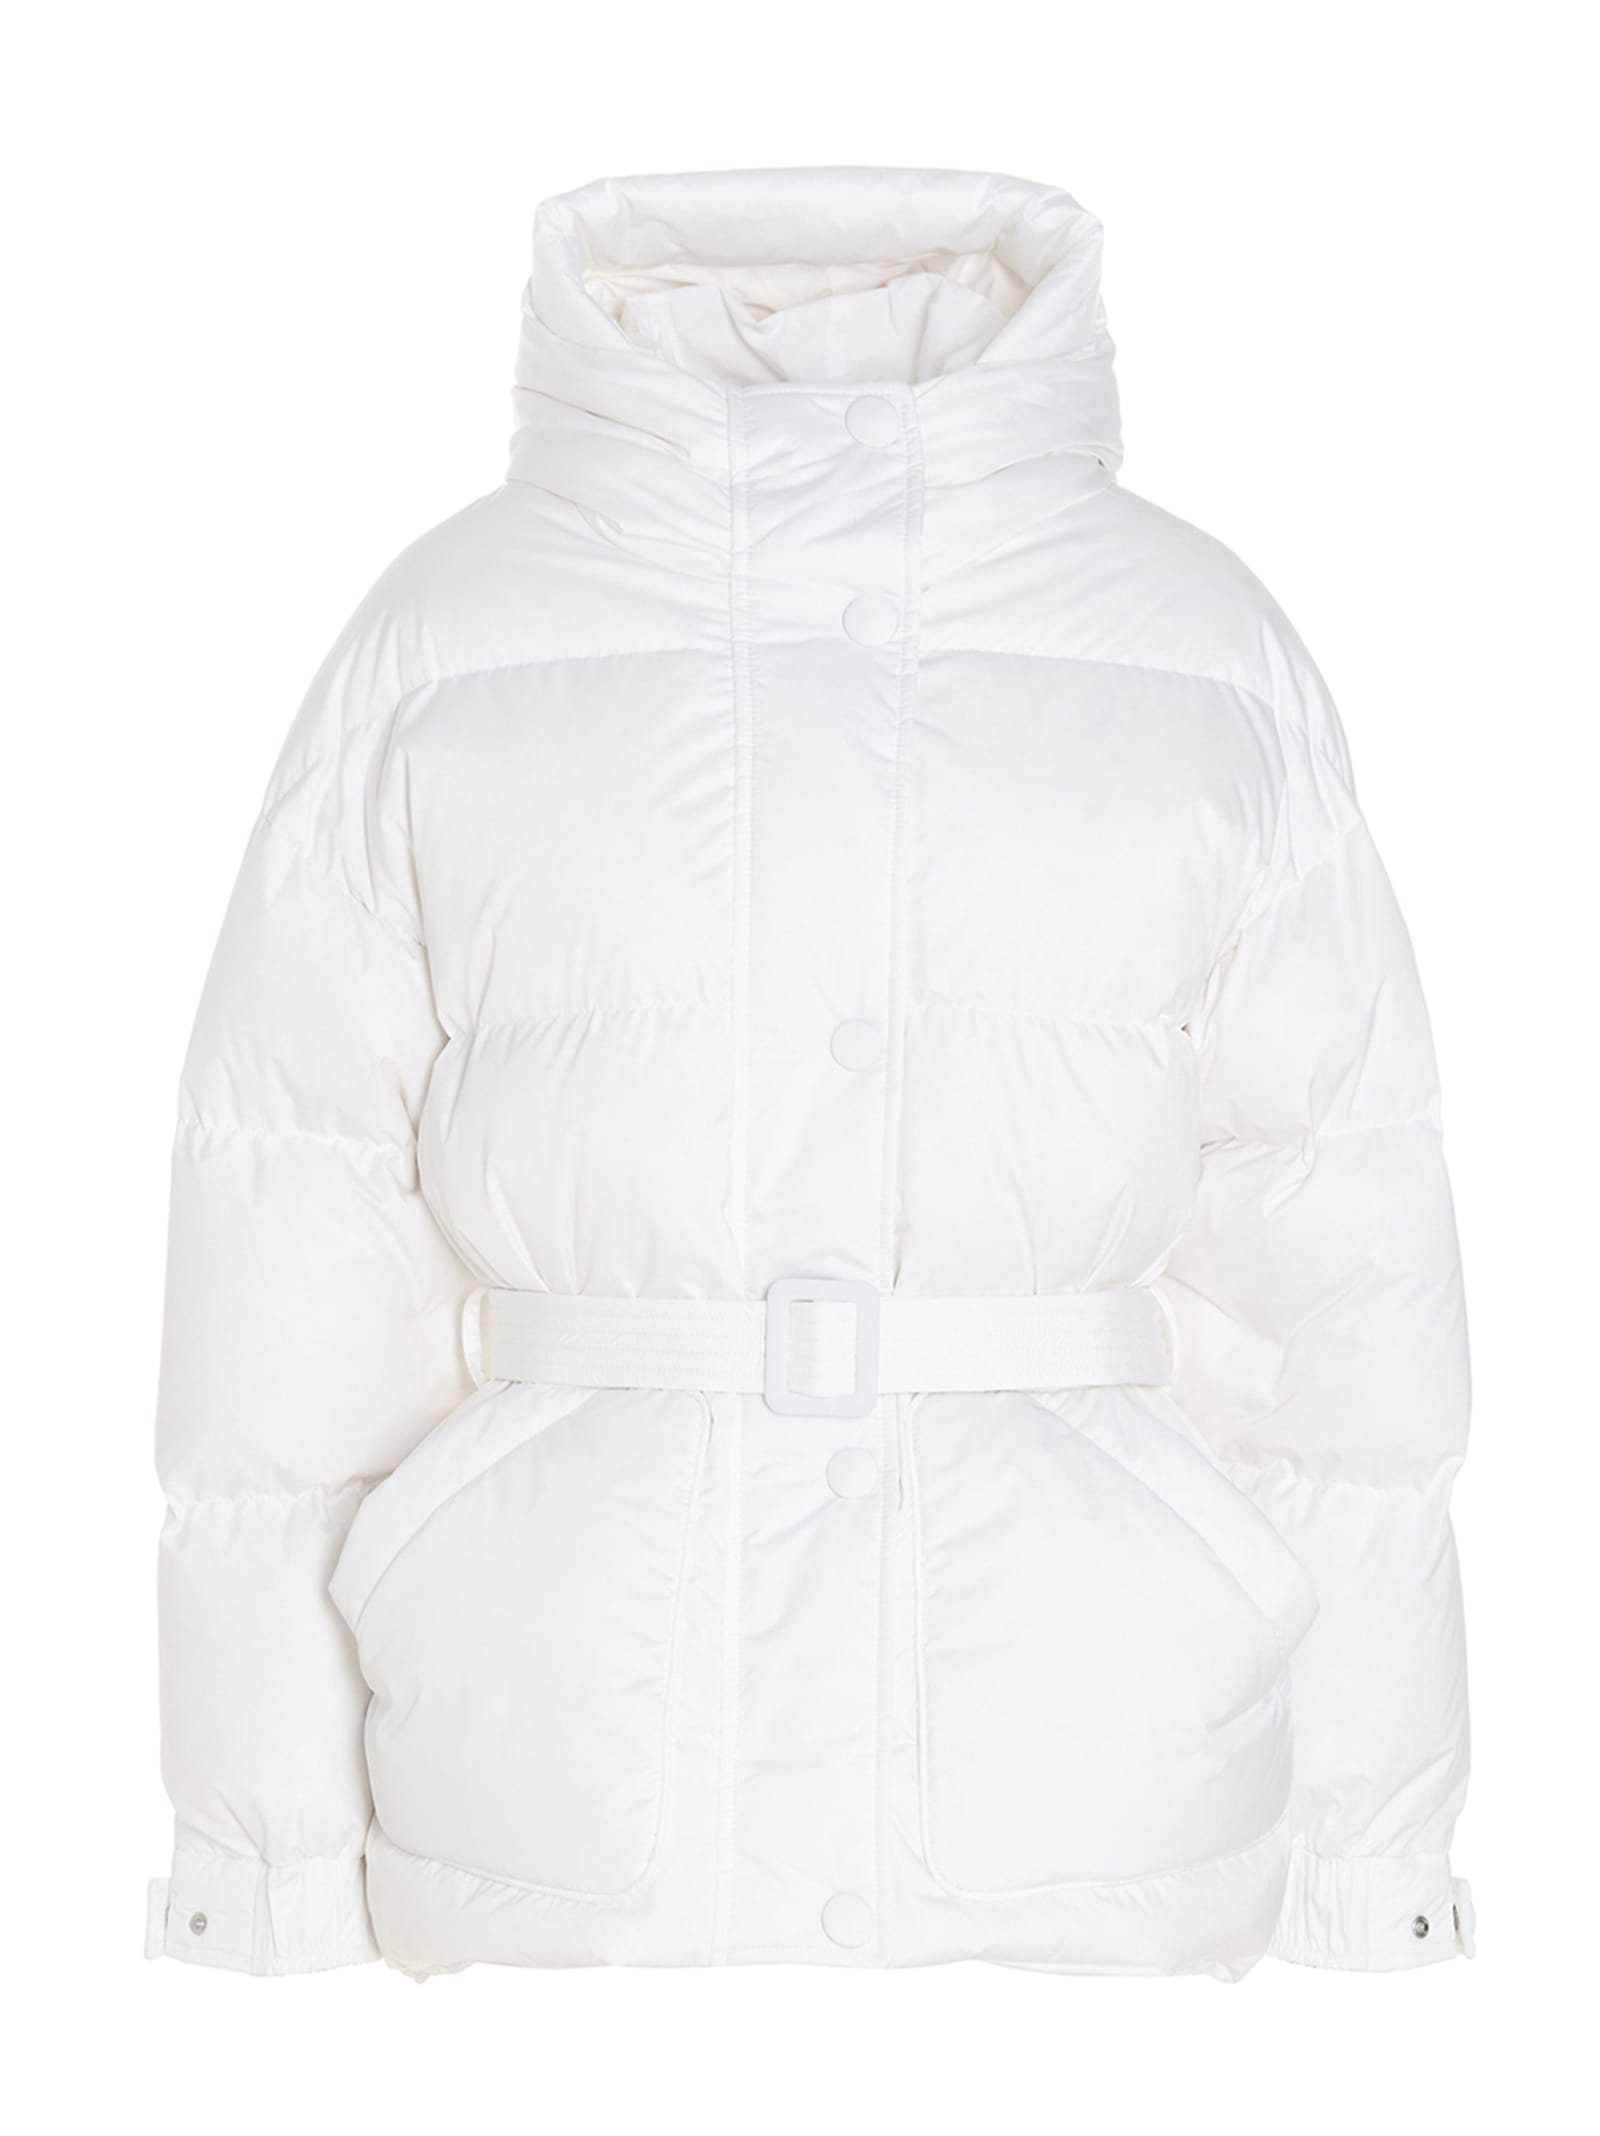 michlin Jacket